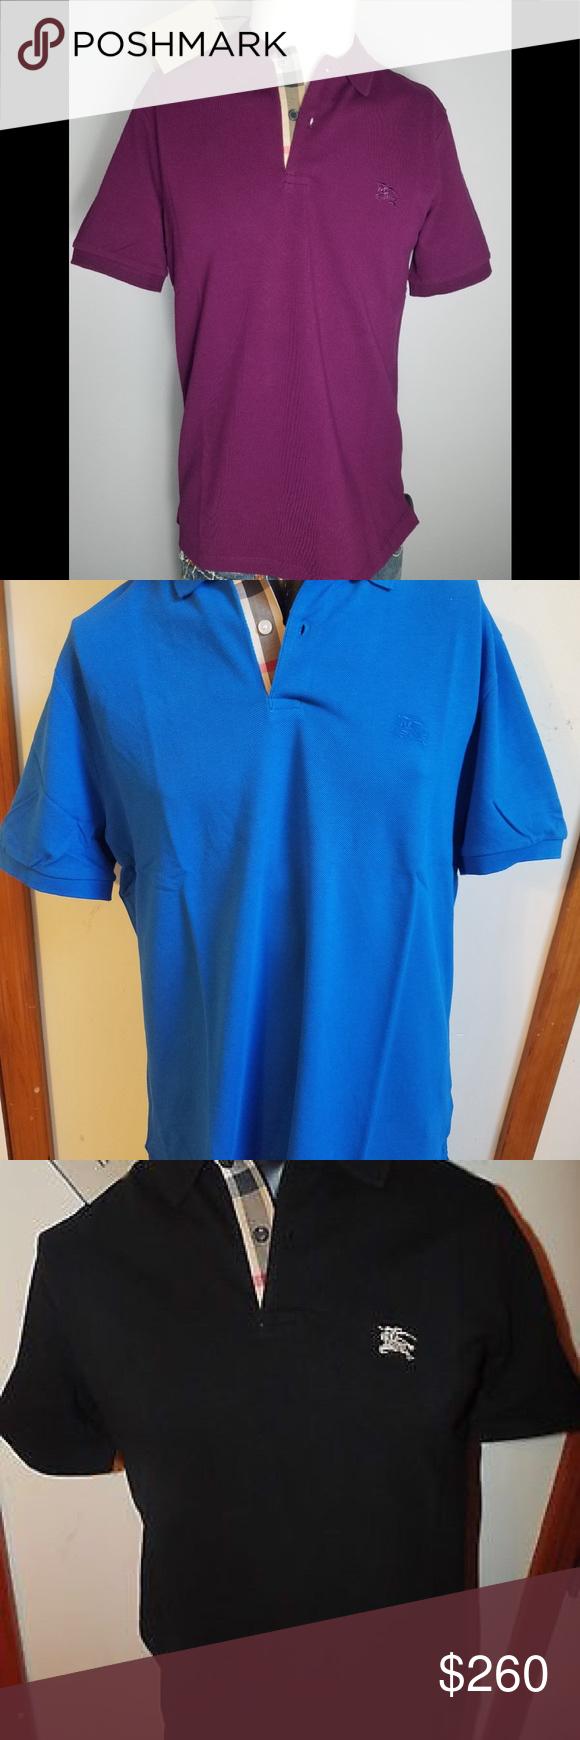 Burberry check polo shirt lot of 4 size 2xl Burberry check polo shirt lot  of 4. A purple,a blue one,a black one and a white all size 2xl Burberry  Shirts ... 869697da5f3a